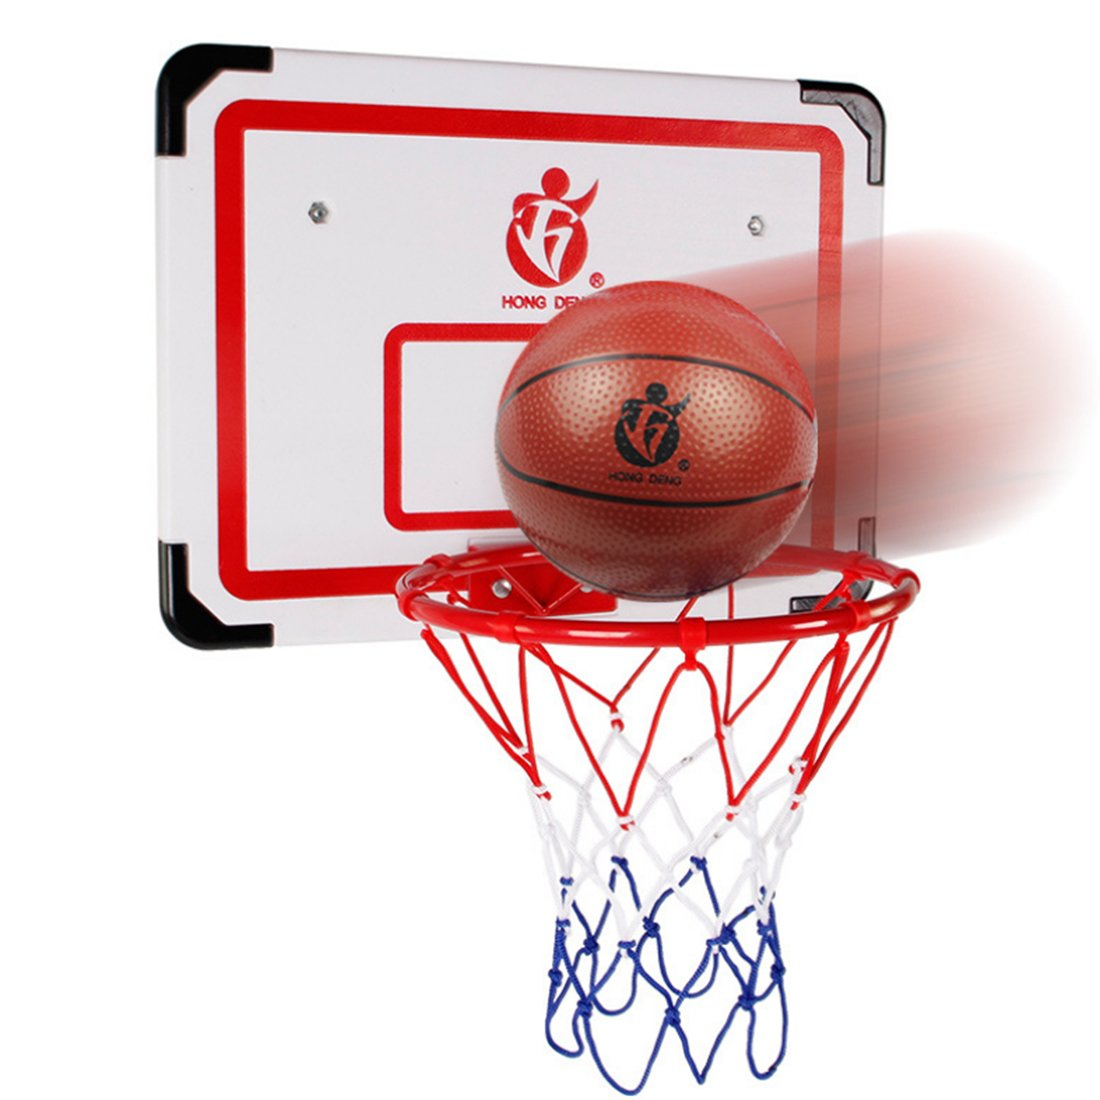 Cesta de baloncesto para ni/ños vicoki 50/cm Formas de Back tarjeta de montaje en pared cesta Ni/ños Teen est/ándar Baloncesto tiro Hoop